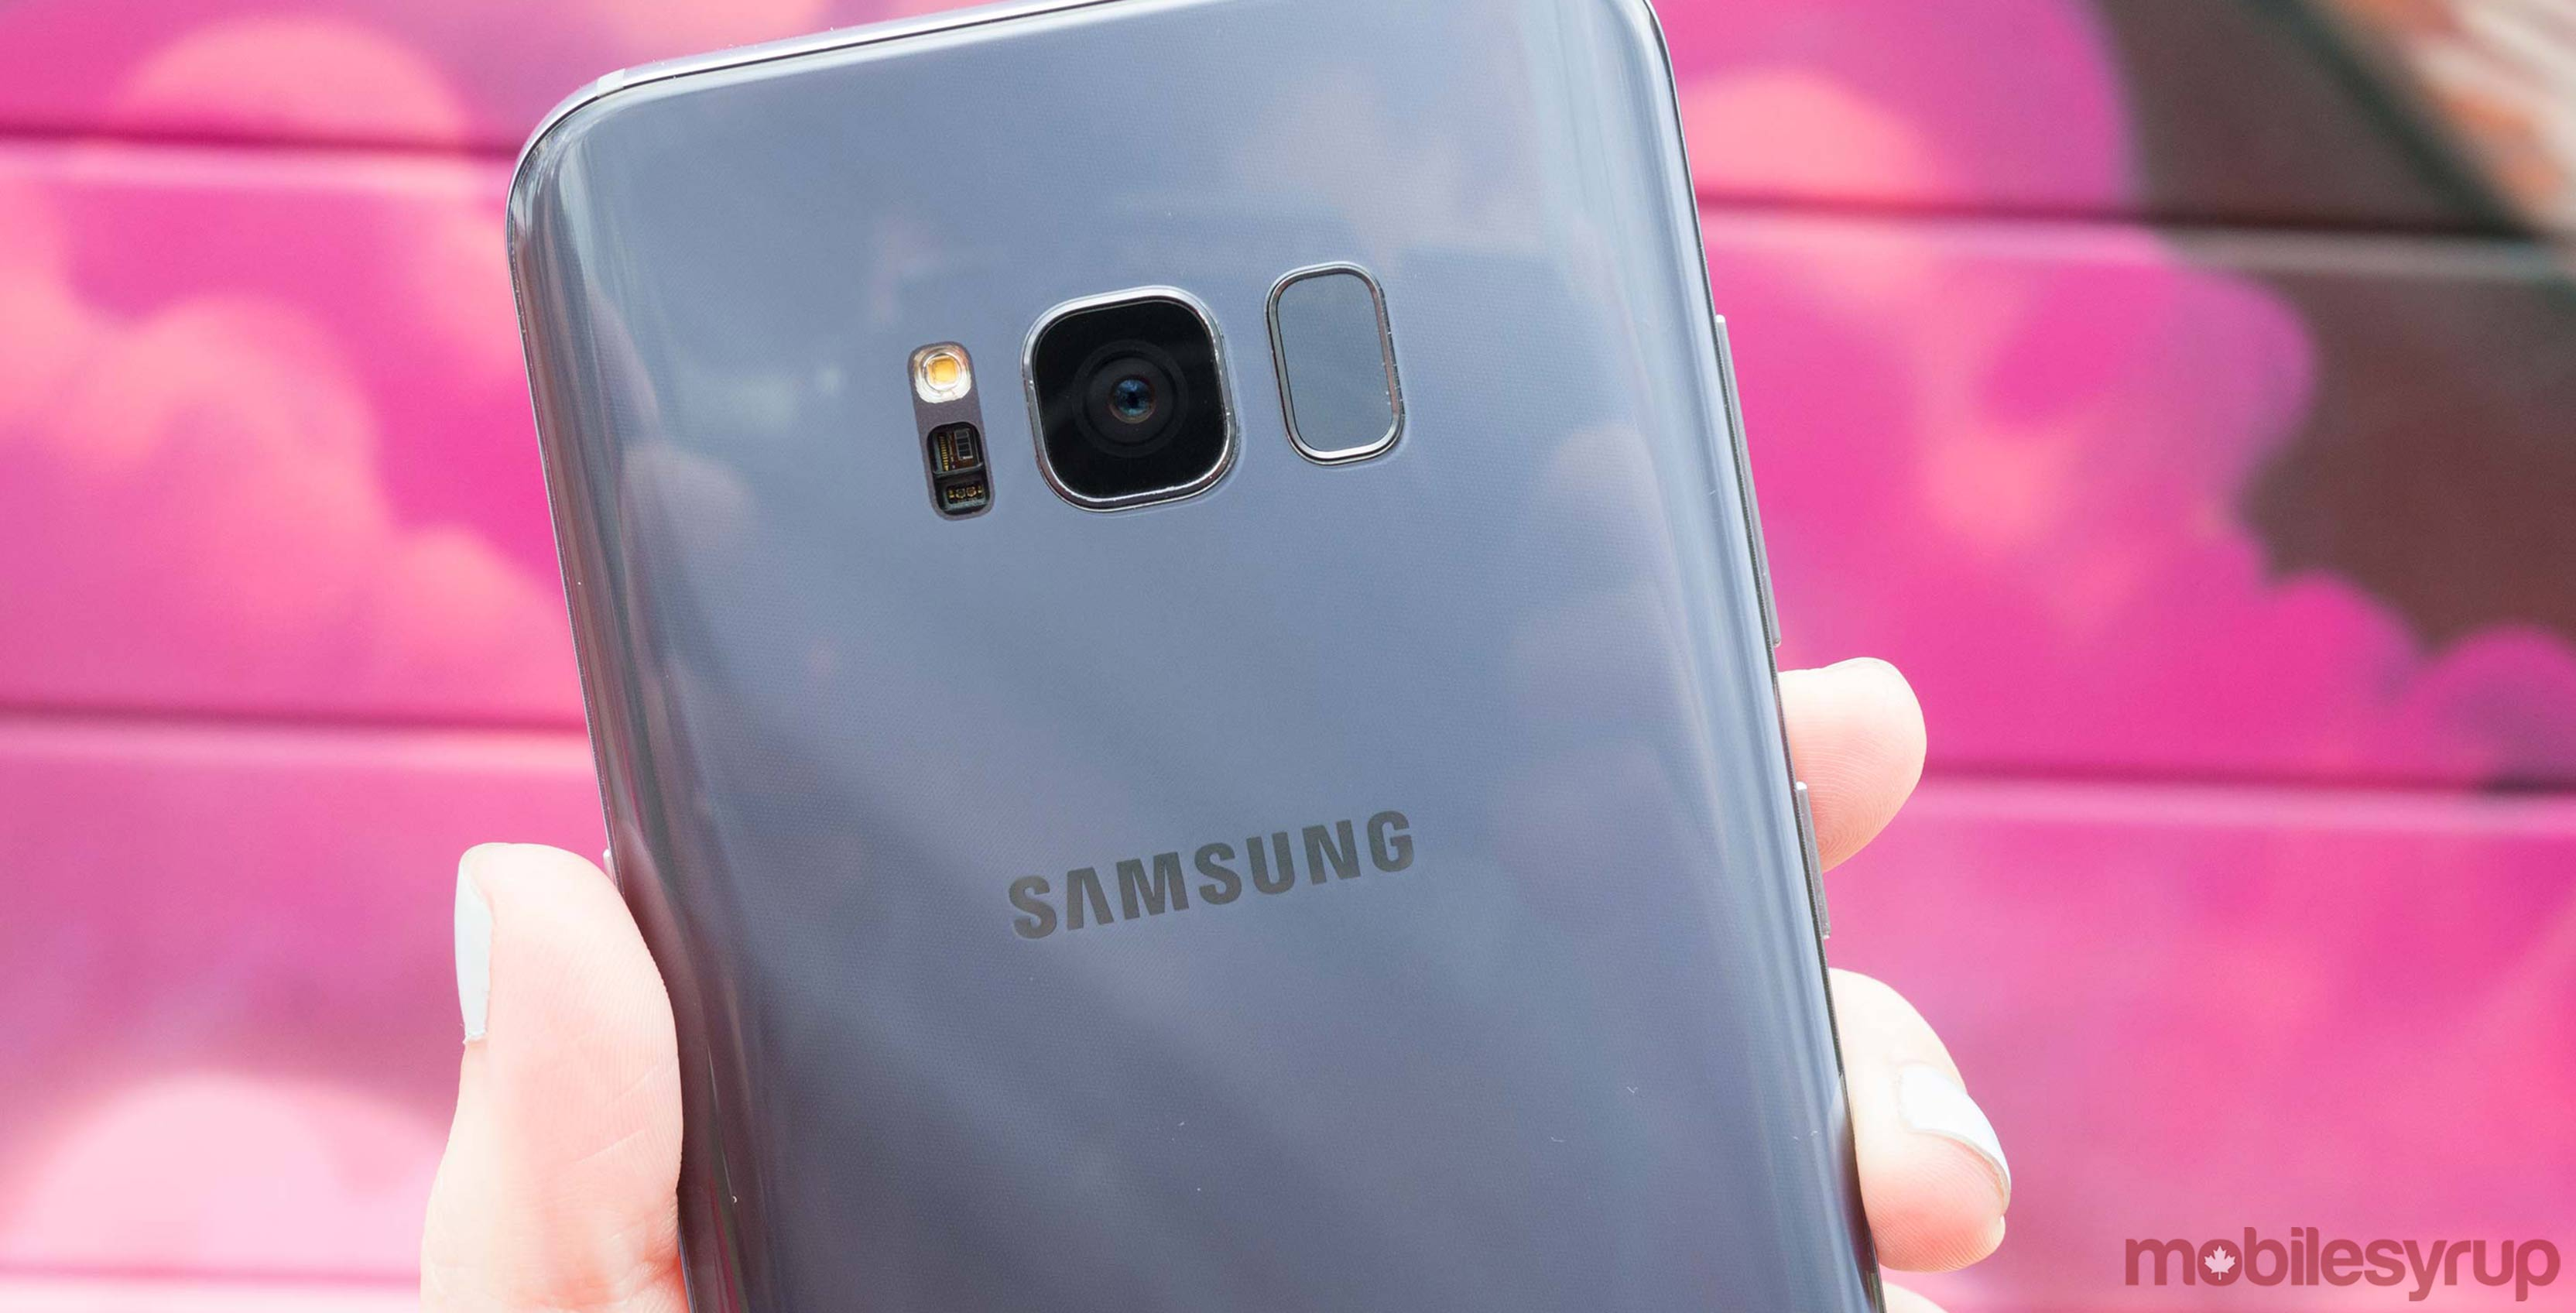 Samsung Galaxy S8 camera bump